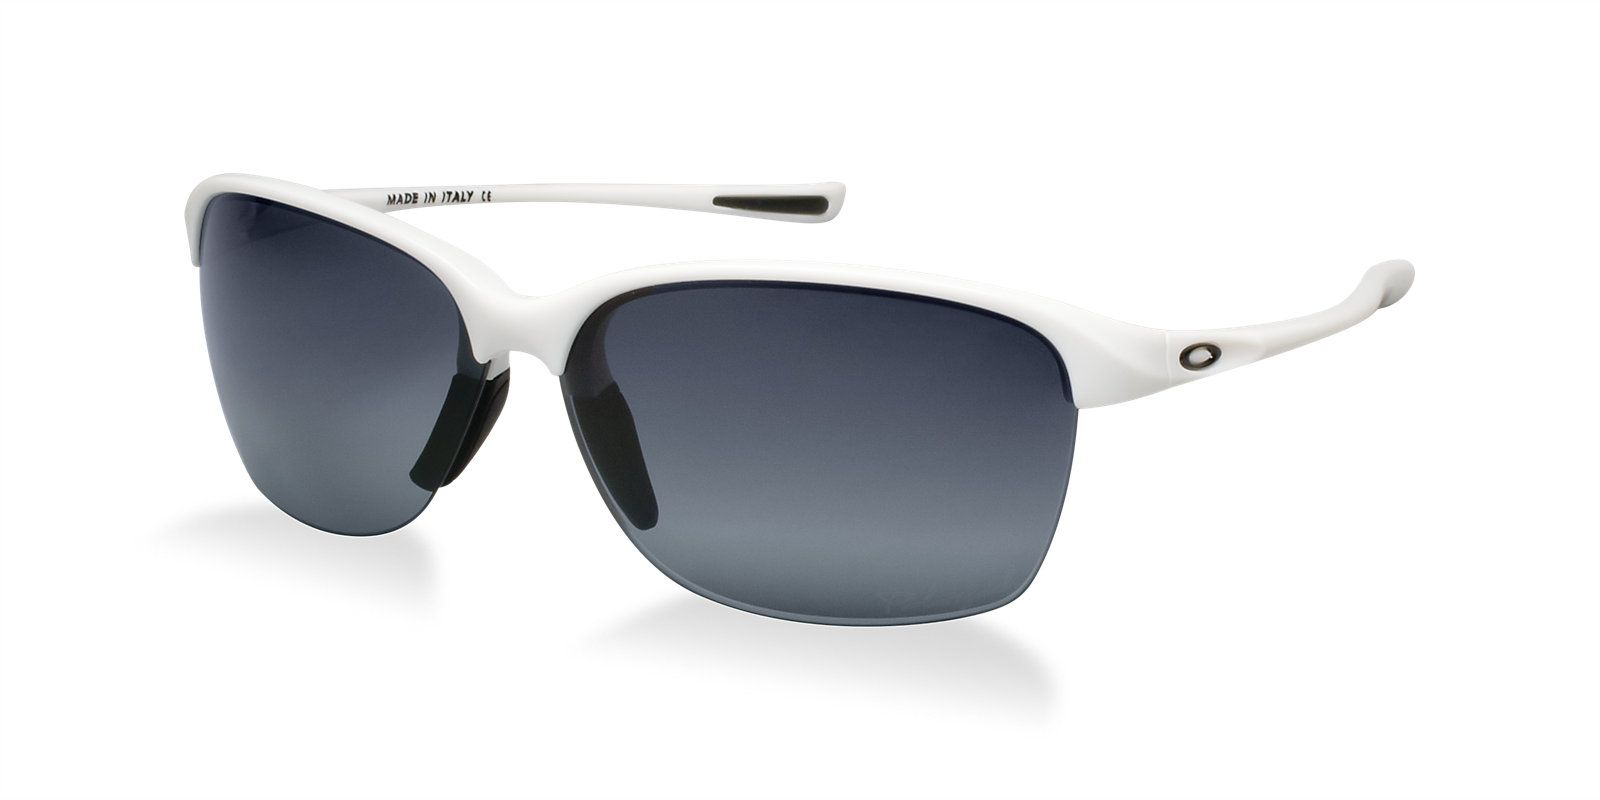 0c36981584f4 Oakley Women s OO9191 UNSTOPPABLE Polarized Sunglasses